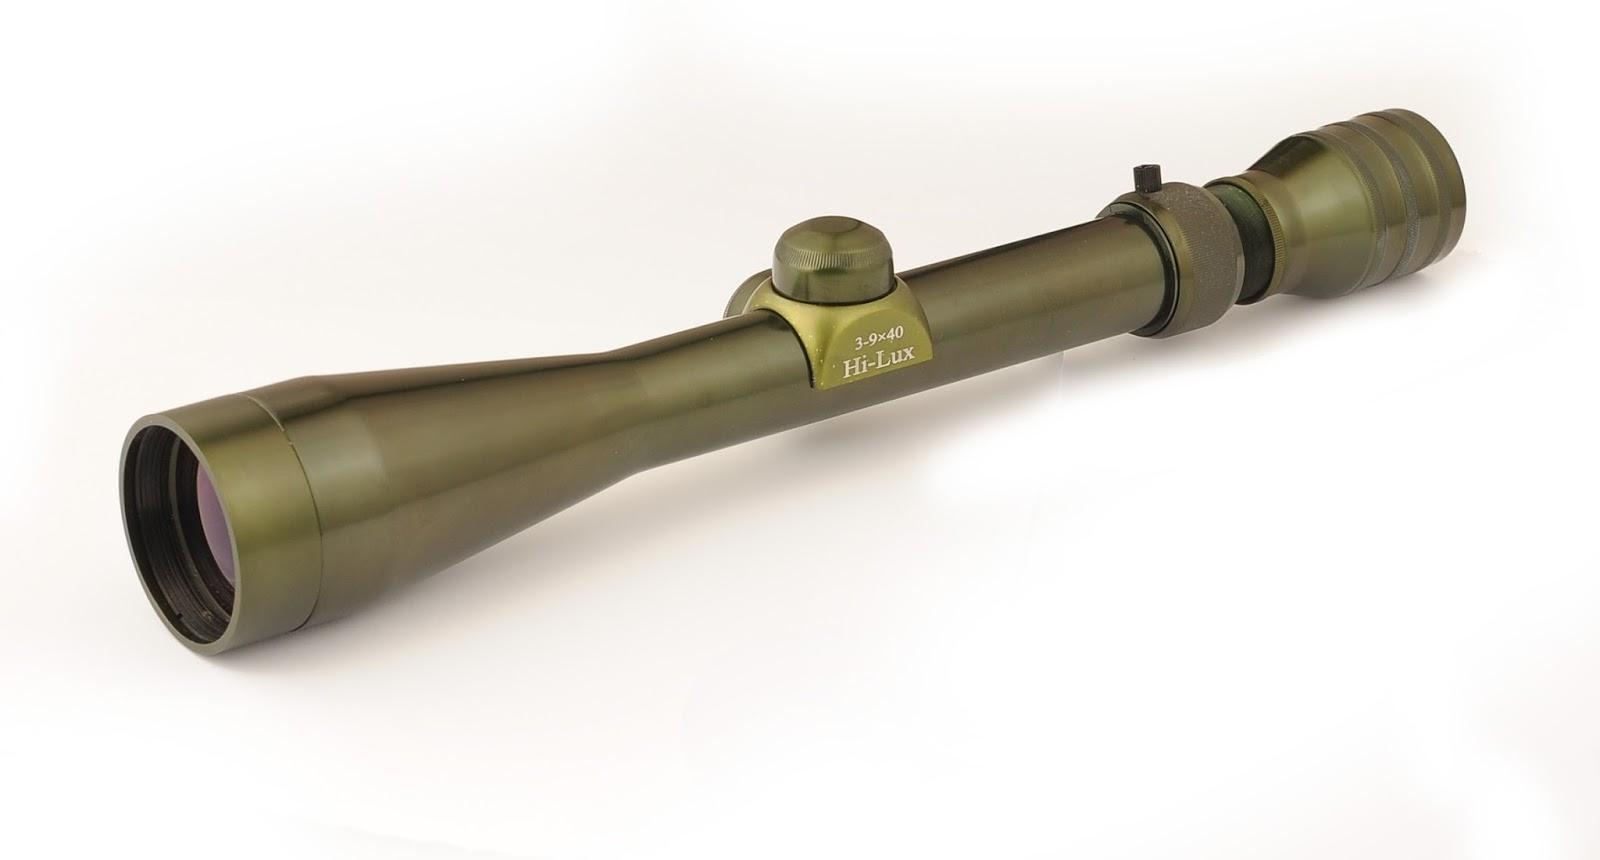 Leatherwood/Hi-Lux Optics: Introducing the M40 Tactical Hunter